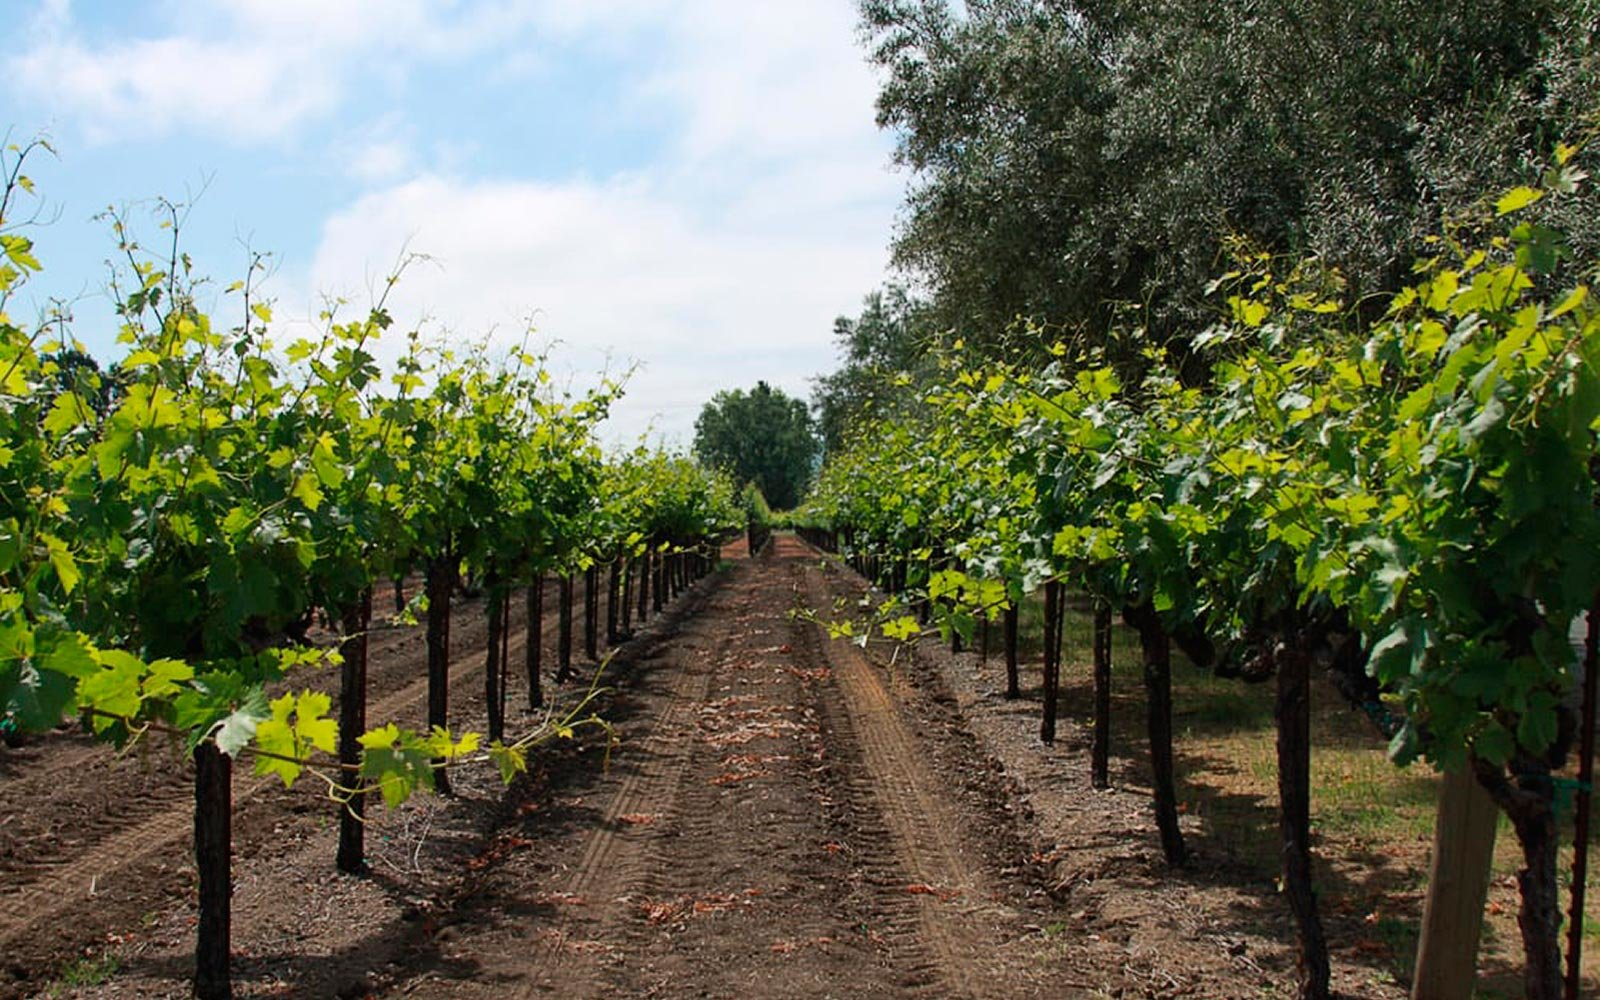 The Top Vineyards All Around The U.s. photo